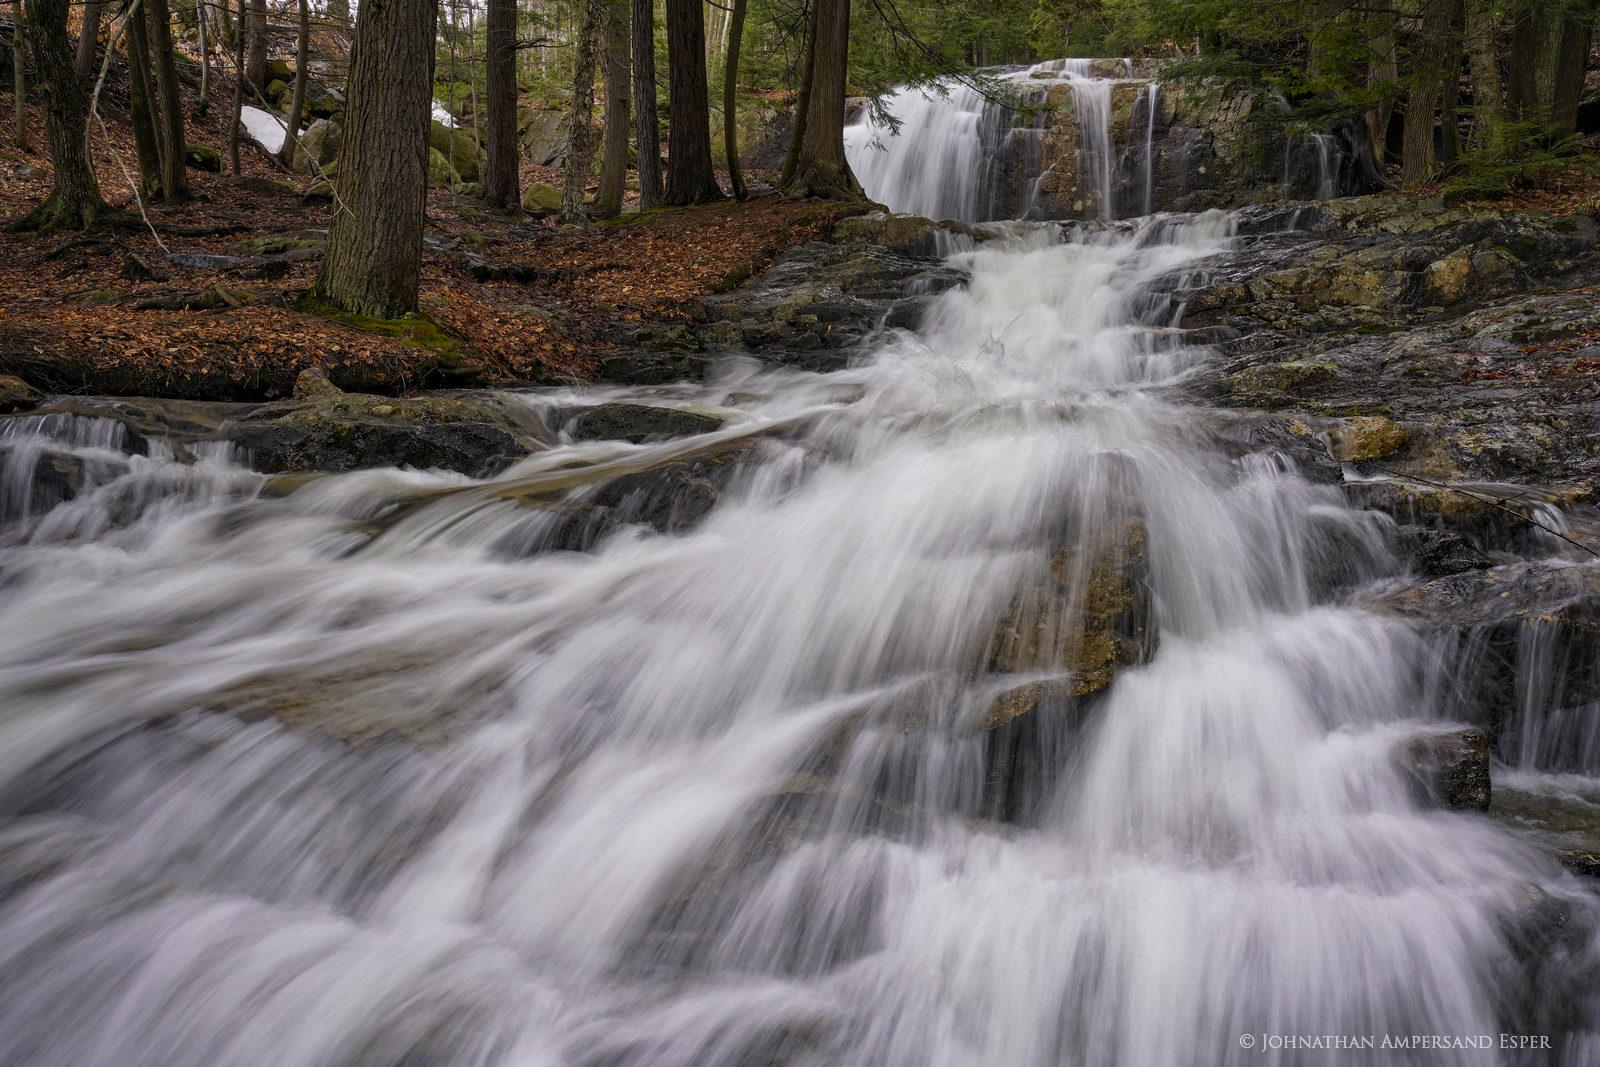 Block Falls,Stag Brook,Stag Brook Falls,Whiteface Mt,Whiteface Mt ski area,Block Falls Stag Brook,waterfall,stream,spring,2020...